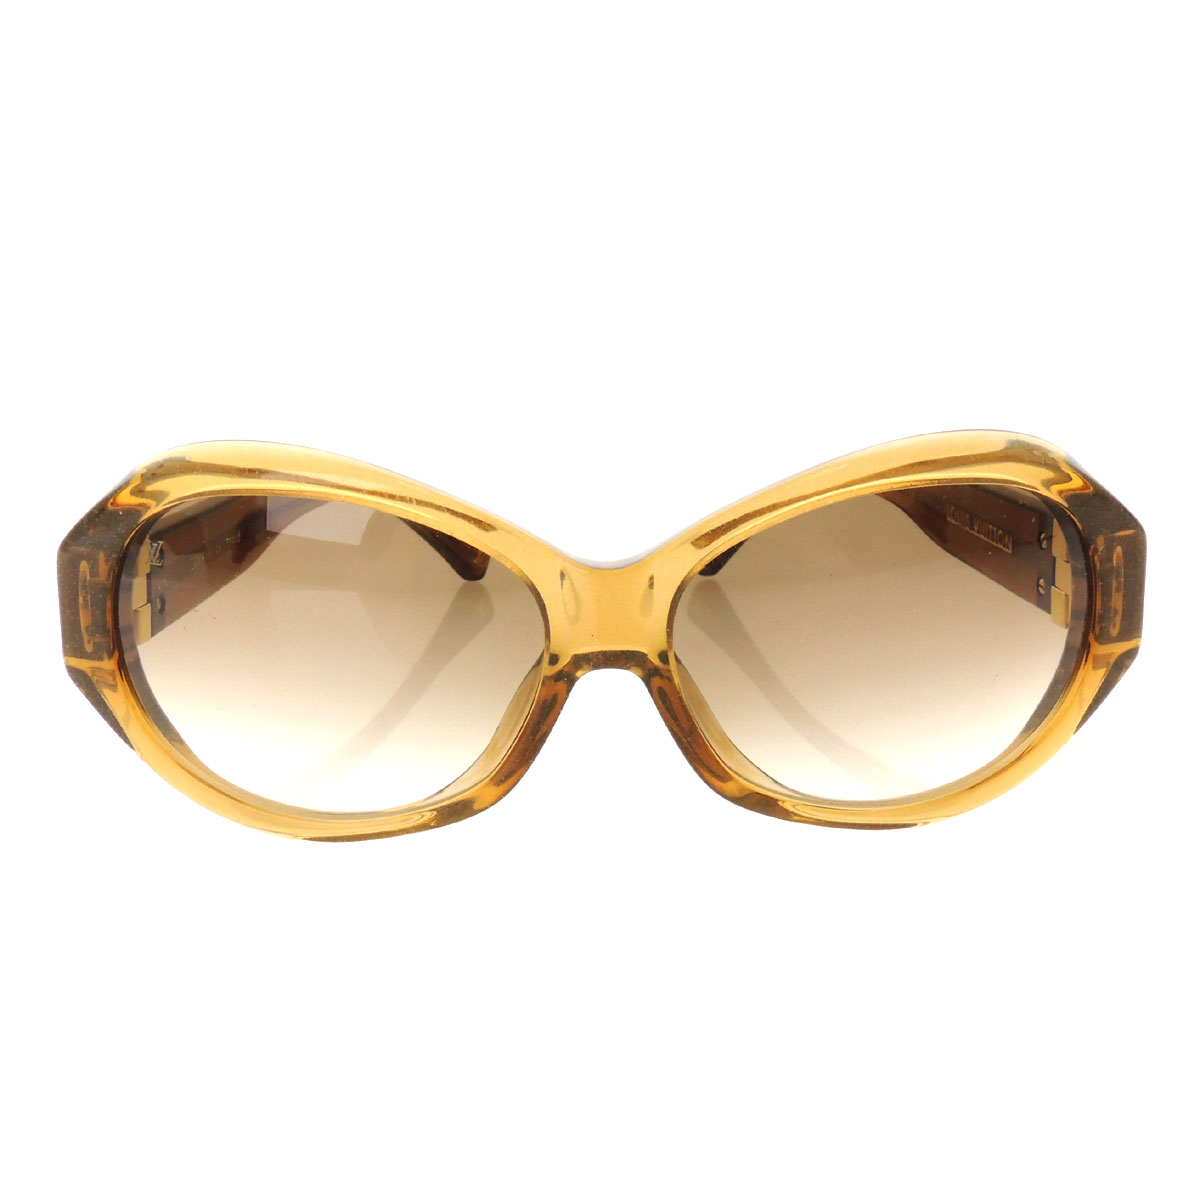 LOUIS VUITTON スプソン-Ron Z0094E sunglasses women